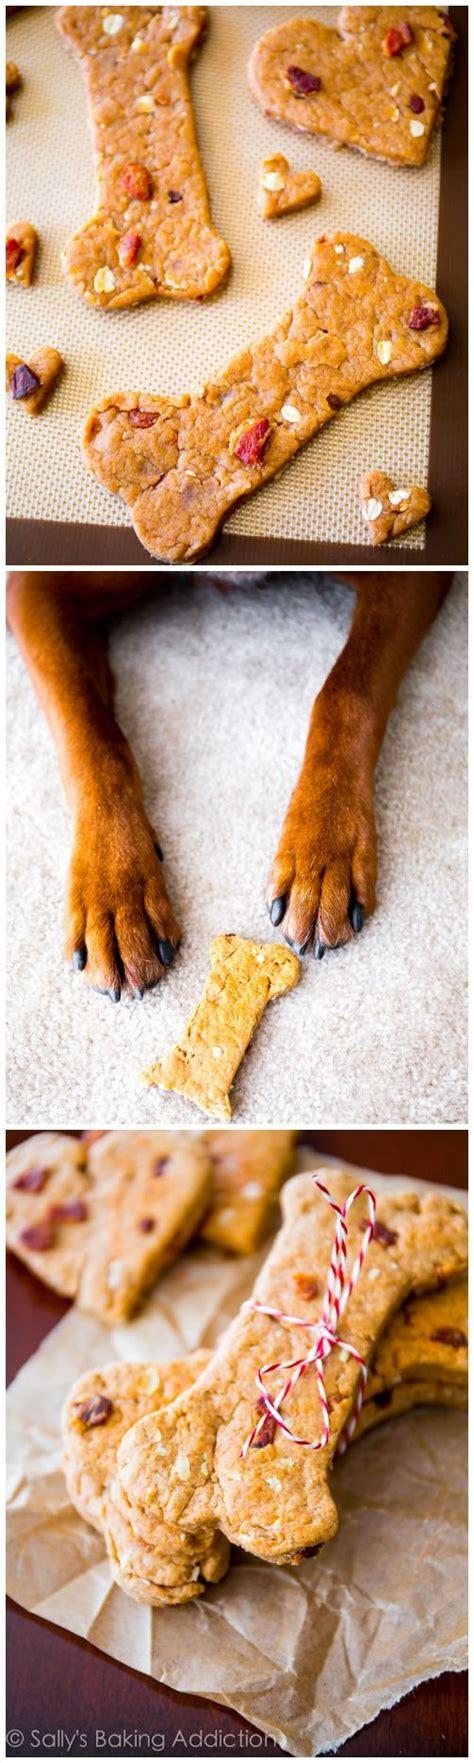 bacon treats peanut butter bacon treats so easy and my pup goes nuts for them